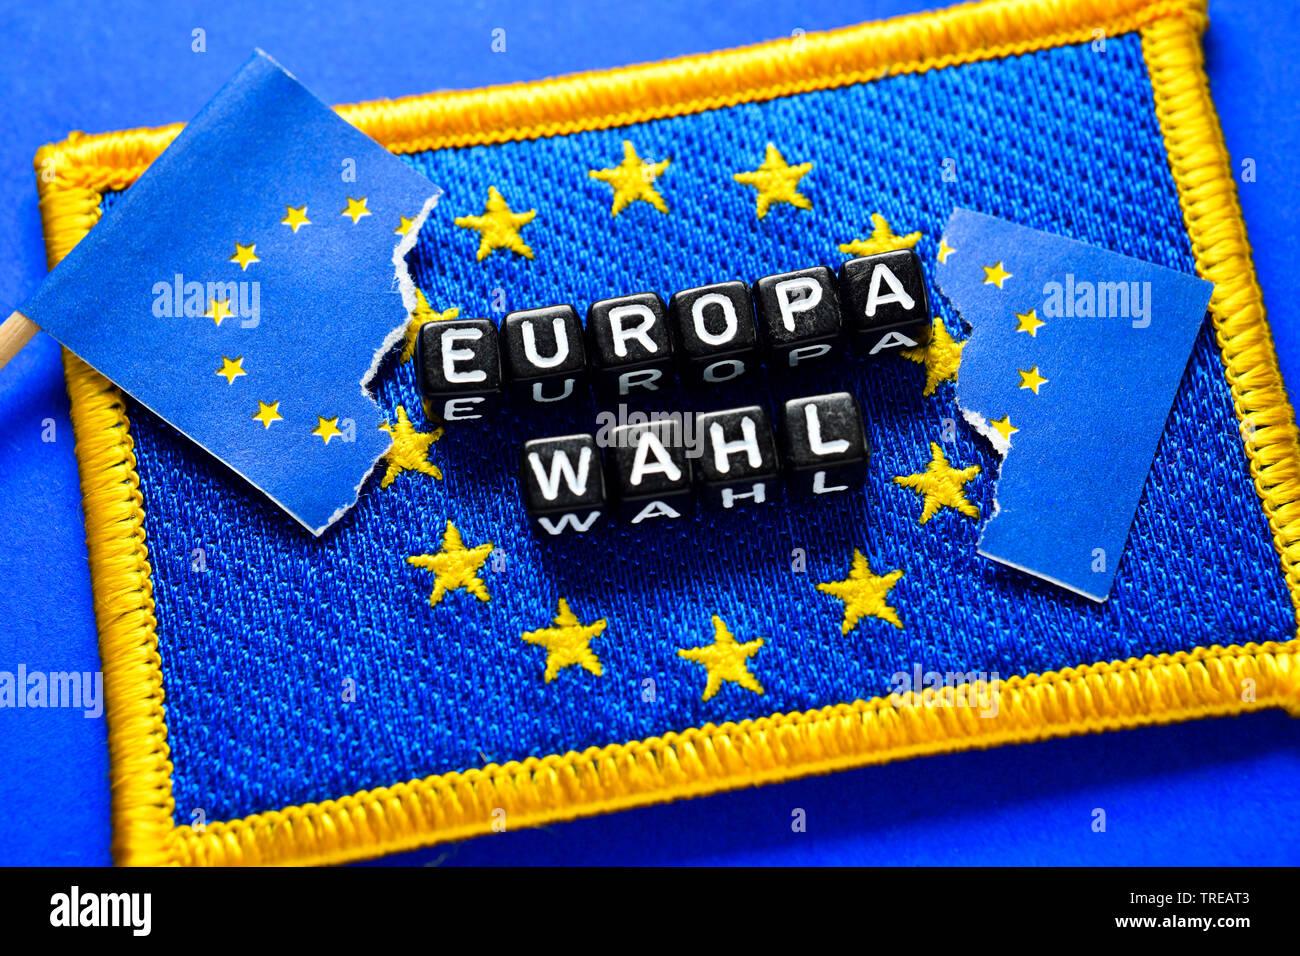 Europaeische Flagge mit Aufschrift EUROPAWAHL | European flag lettering EUROPAWAHL (European election) | BLWS521656.jpg [ (c) blickwinkel/McPHOTO/C. O - Stock Image